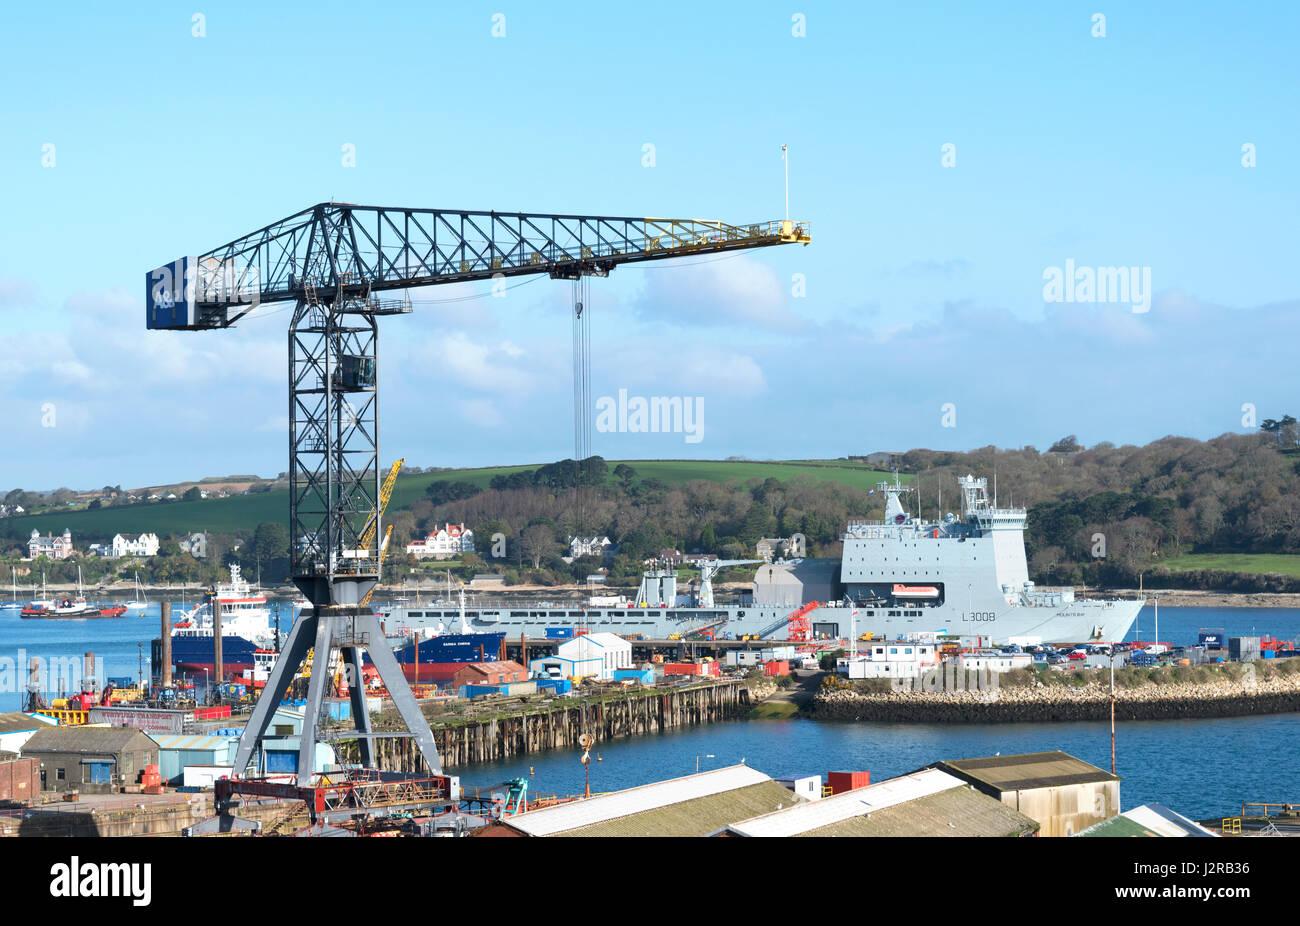 Chantier Pendennis à Falmouth docks à Cornwall, Angleterre, Grande-Bretagne, Royaume-Uni. Banque D'Images